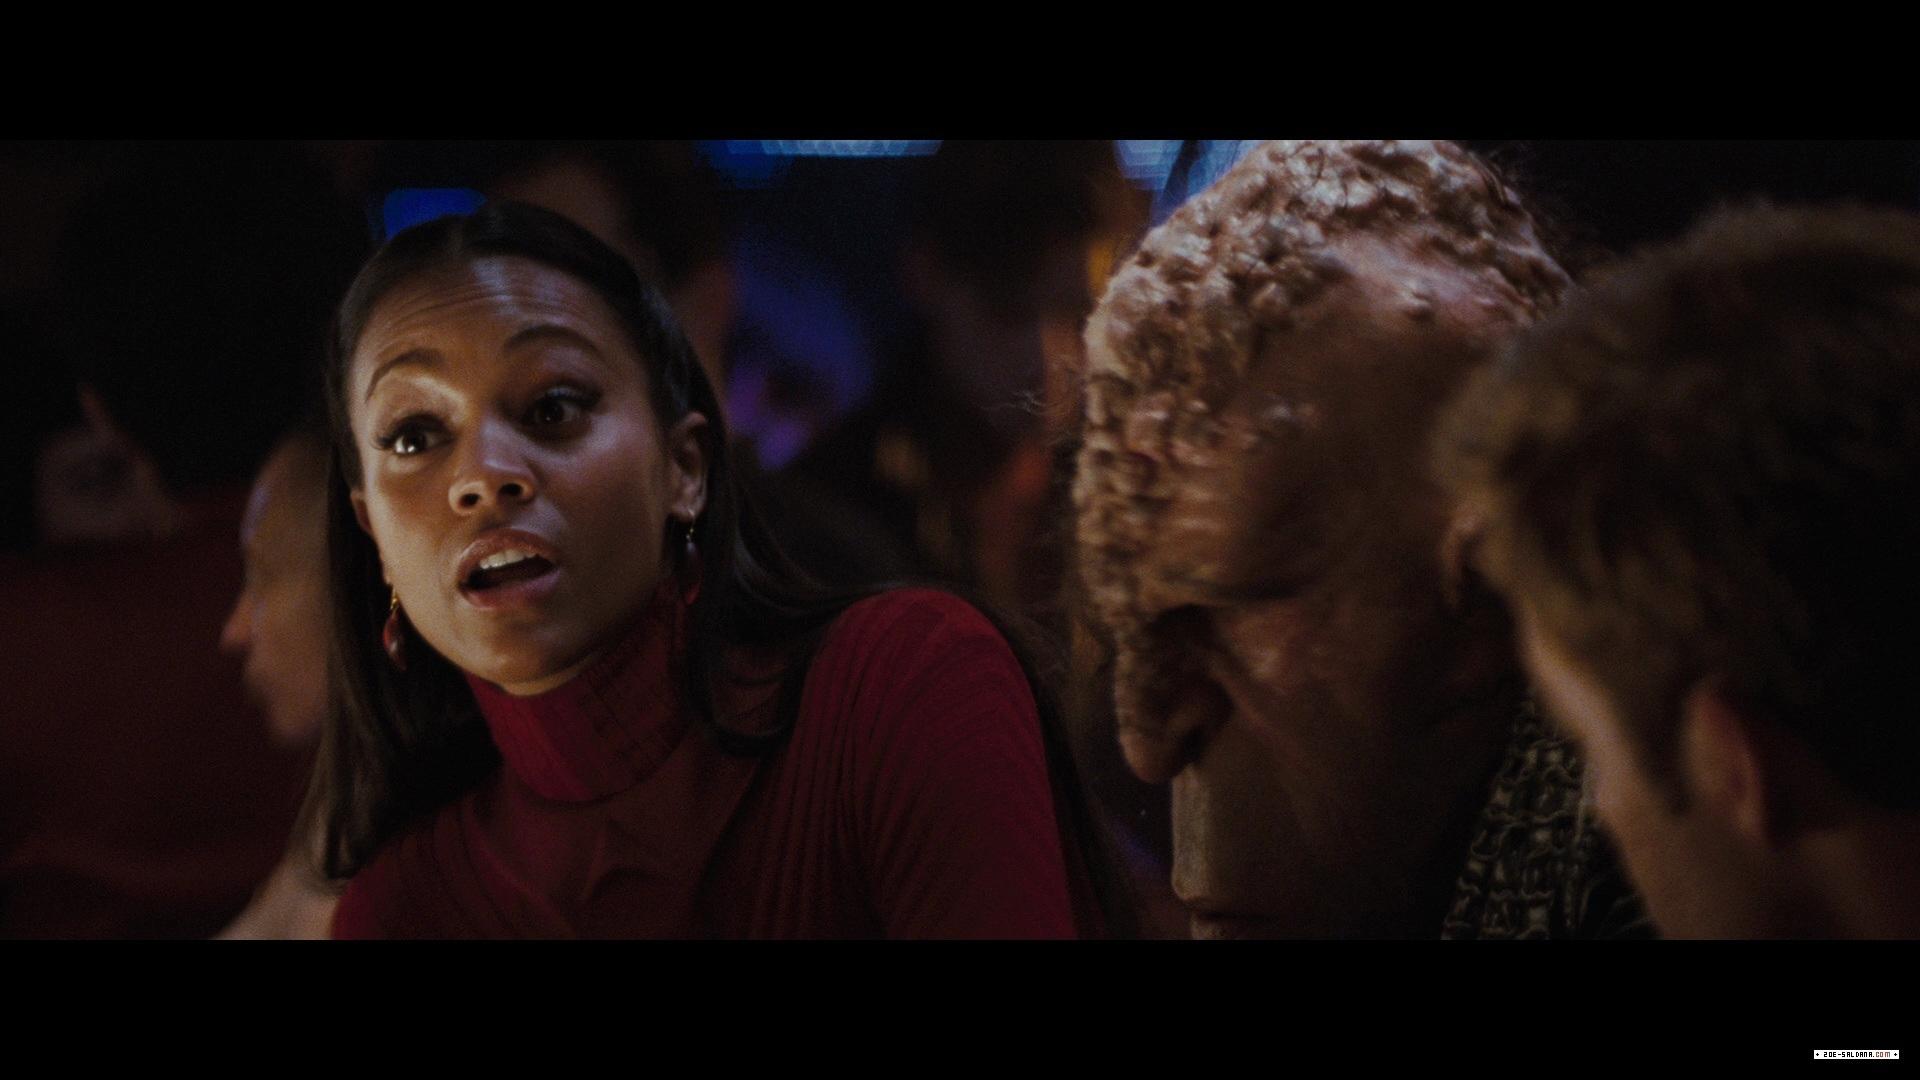 Zoe-Saldana-Star-Trek-screencaps-zoe-saldana-9857678-1920-1080 jpgZoe Saldana Star Trek